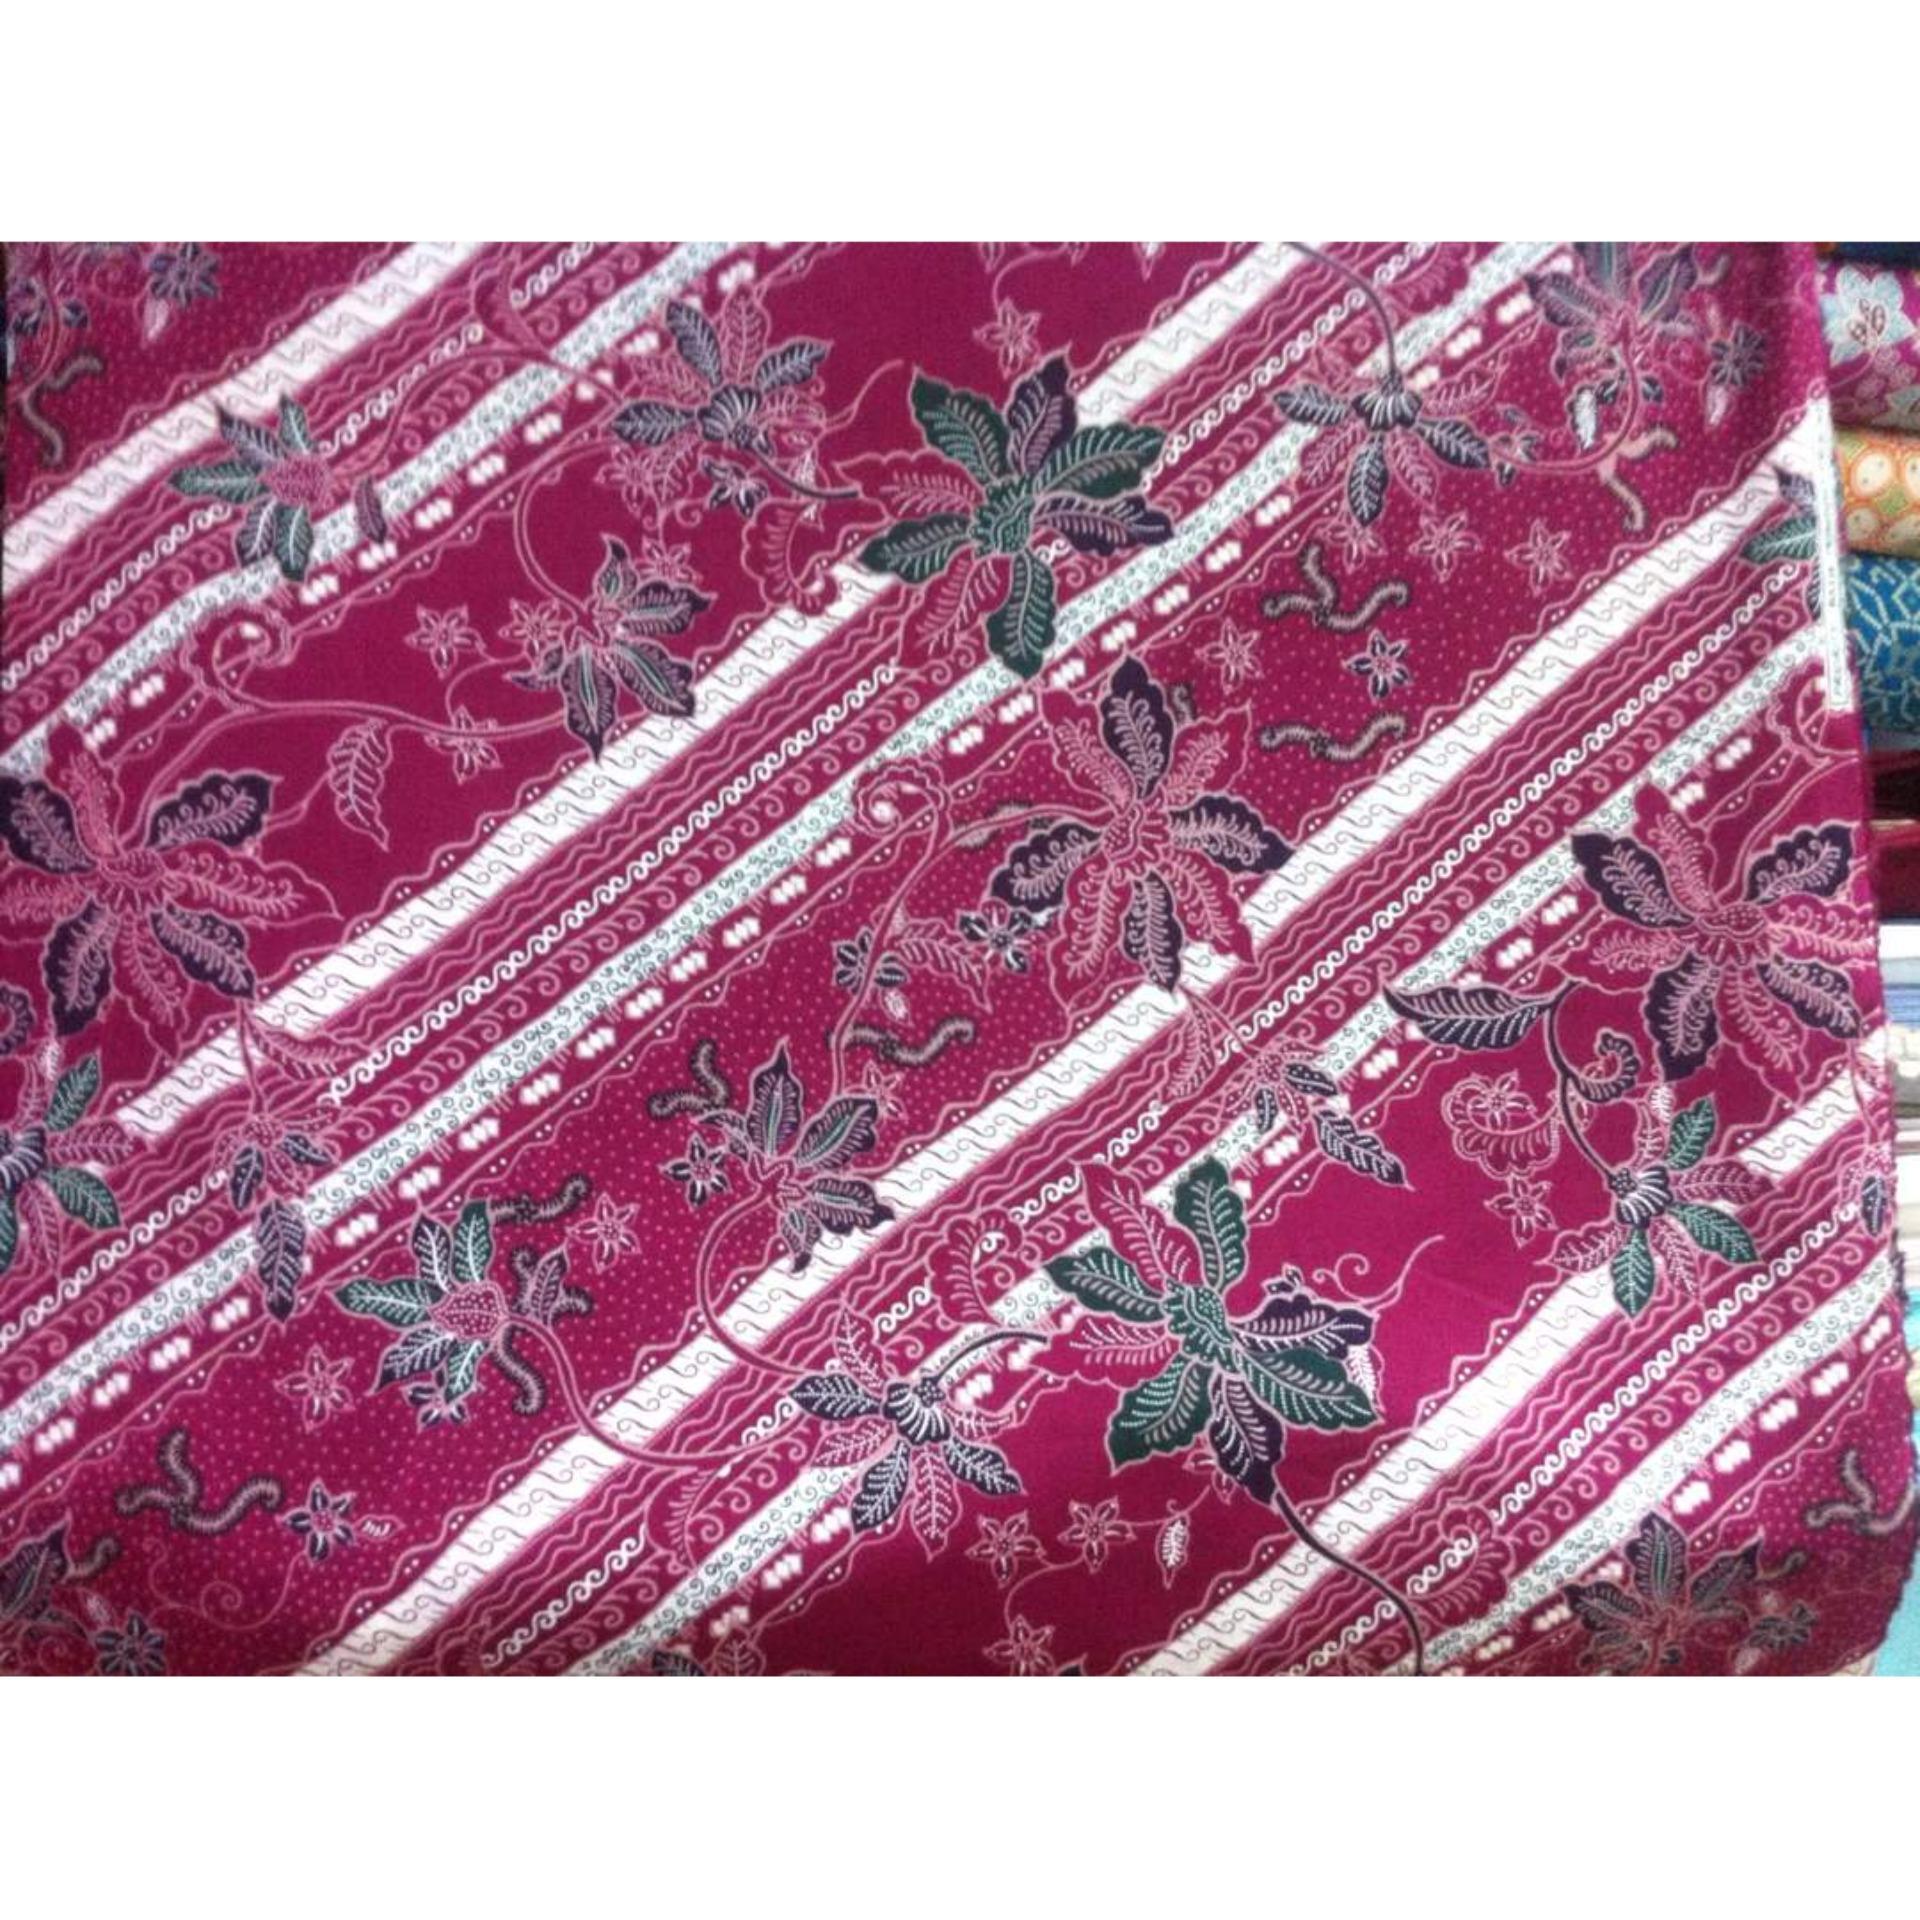 Ojala Batik Kain Cap Pagi Sore Coklat A Daftar Harga Set Embos Asli Pekalongan Unik Dan Flash Sale Ftex Printing Motif Bunga Rambat Magenta